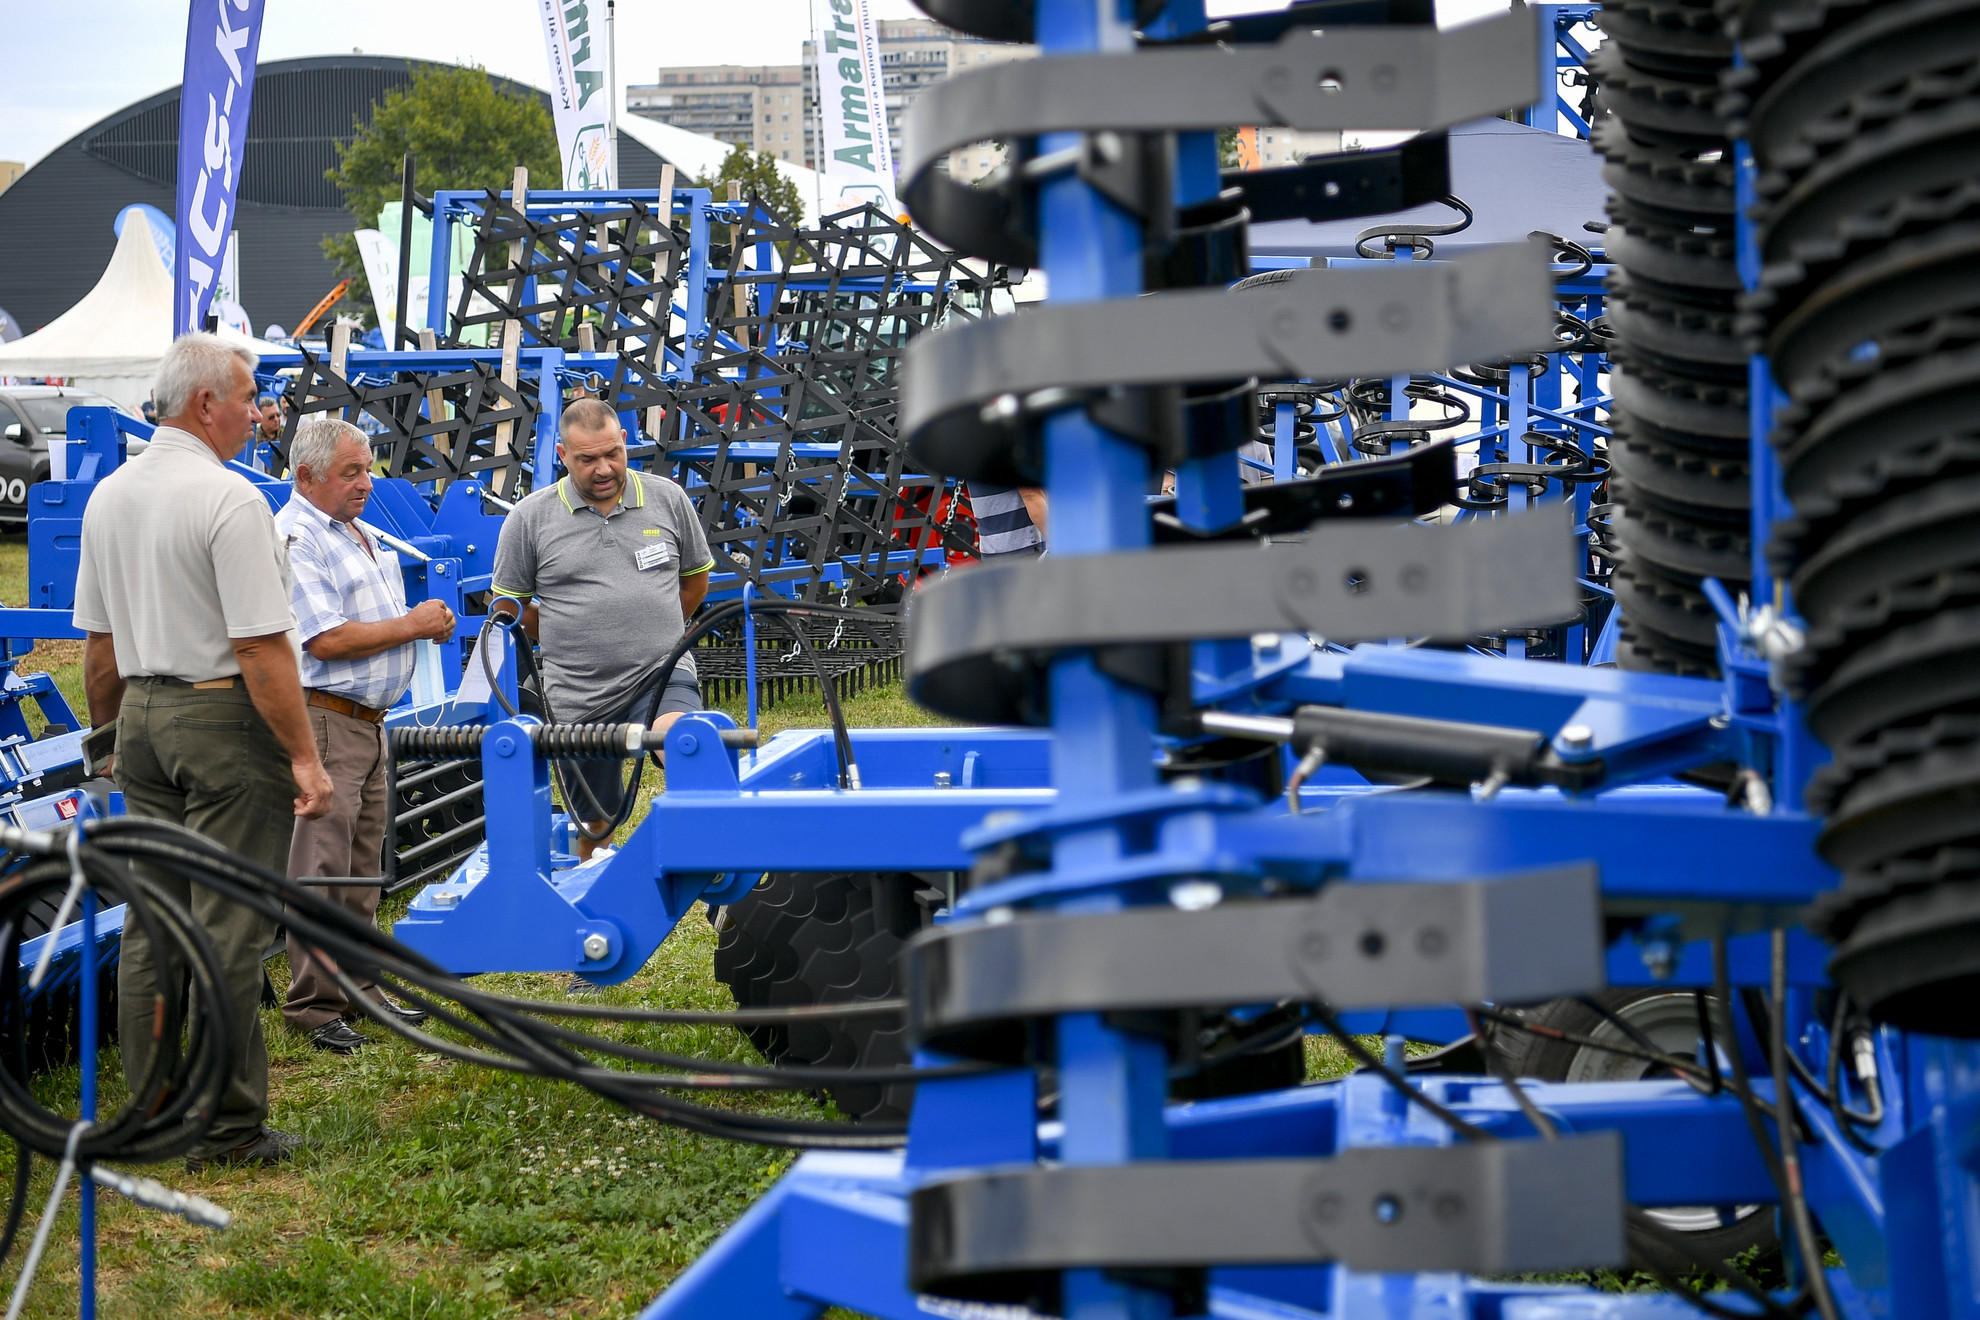 A 29. Farmer Expo a megnyitó napján Debrecenben